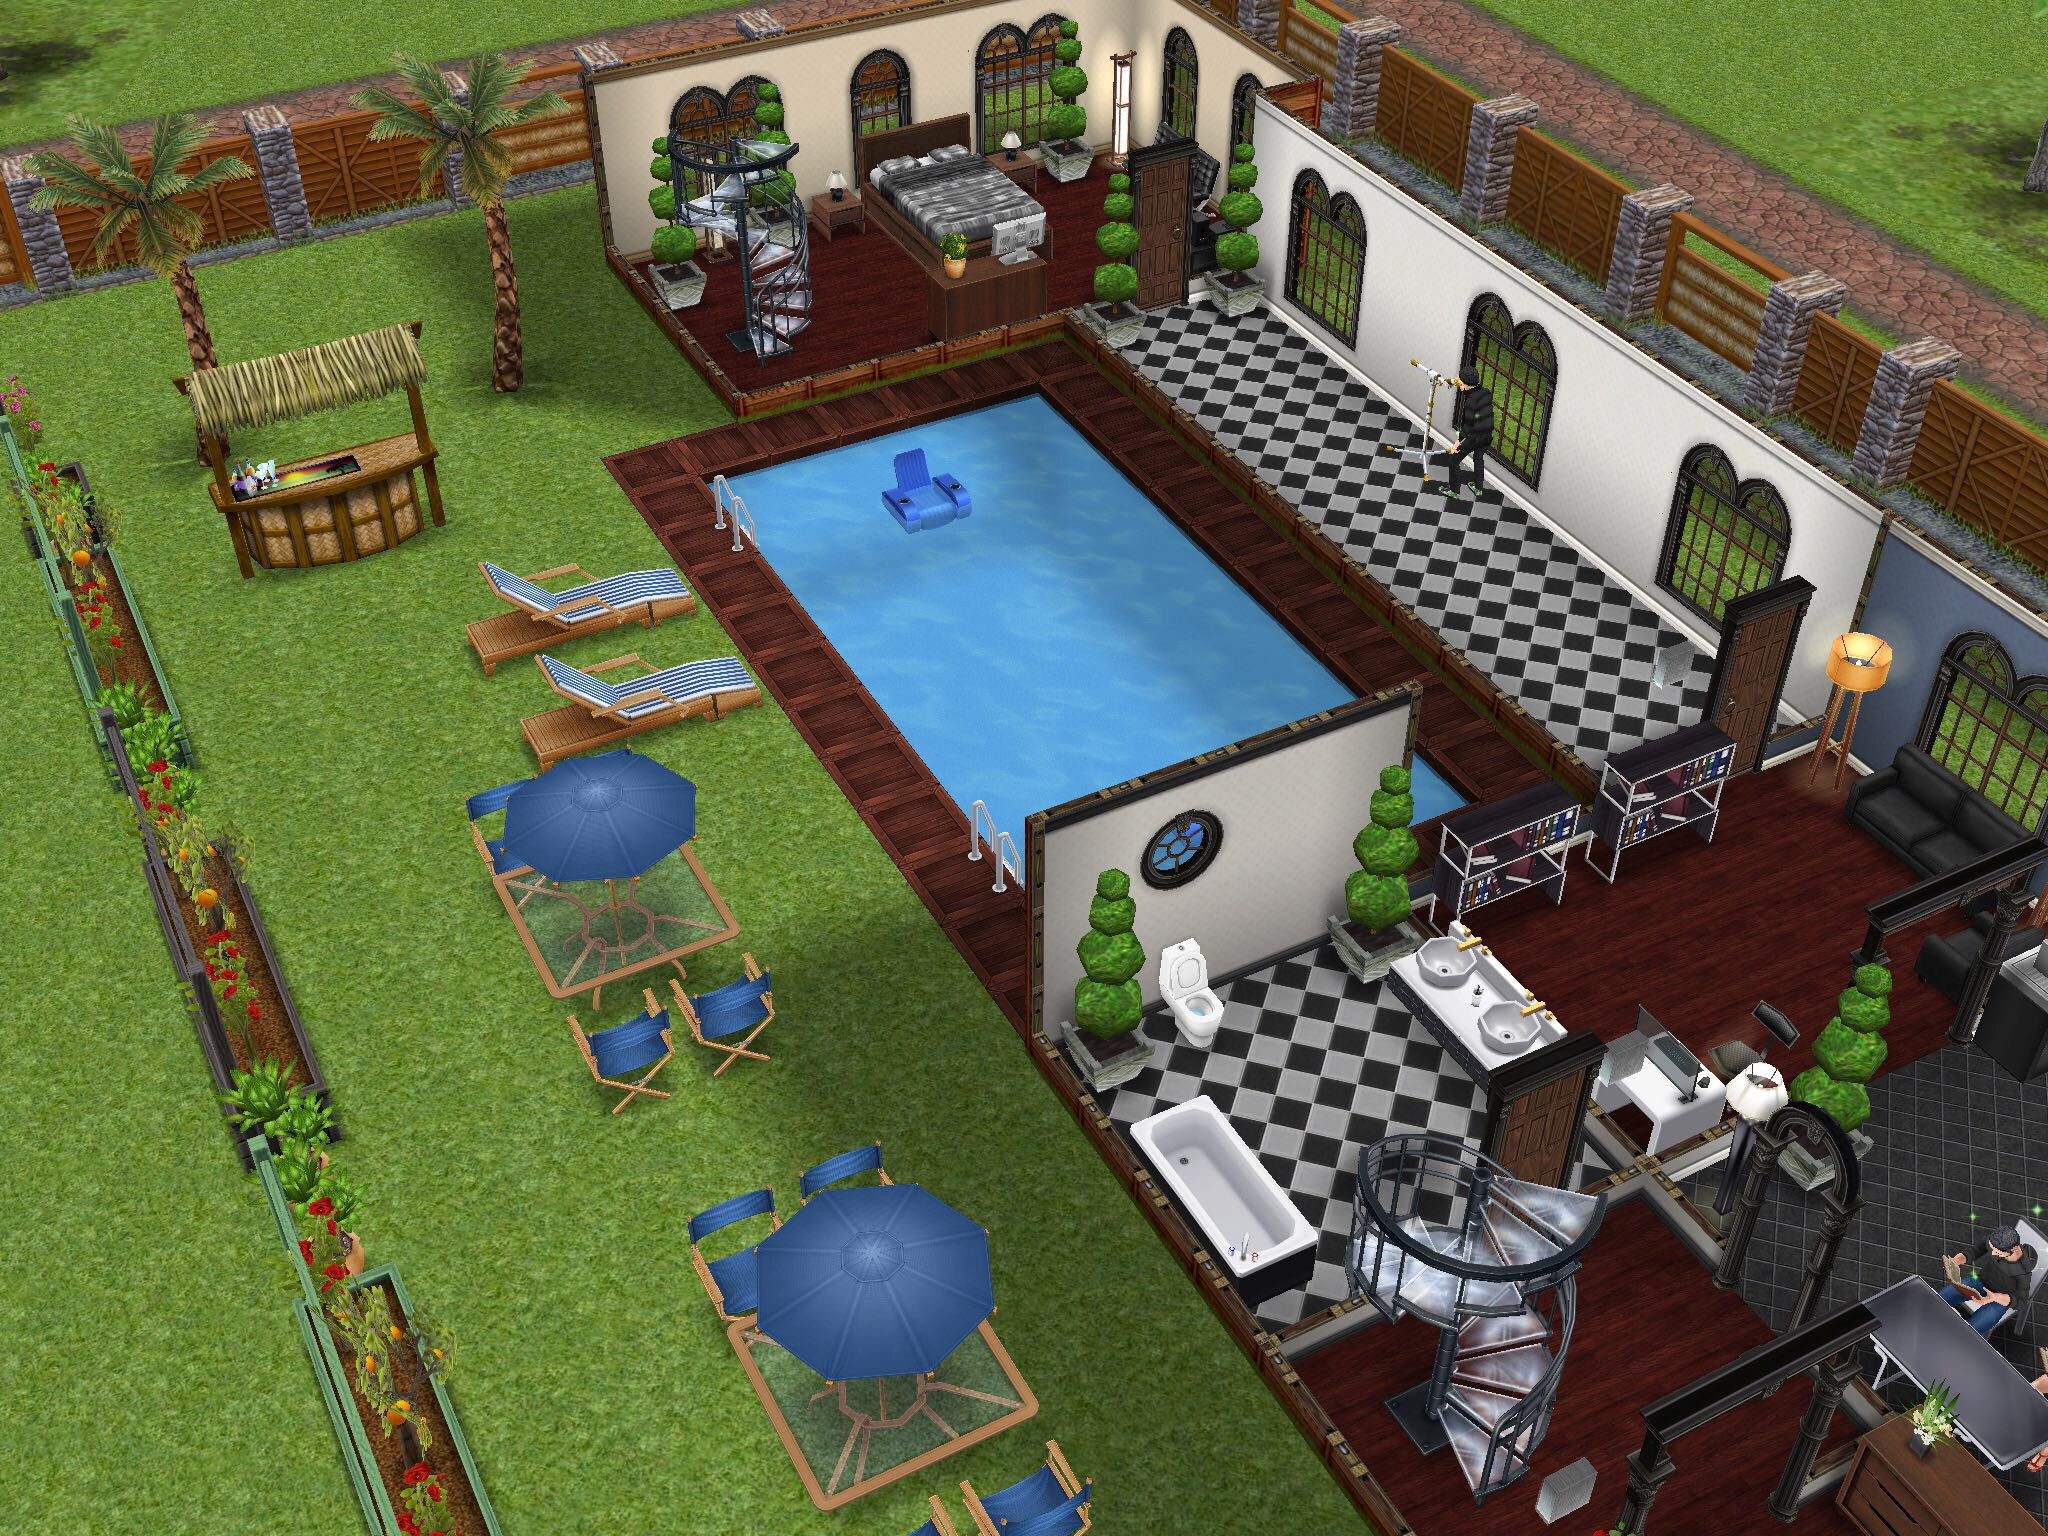 backyard pool design idea sims freeplay house design ideas